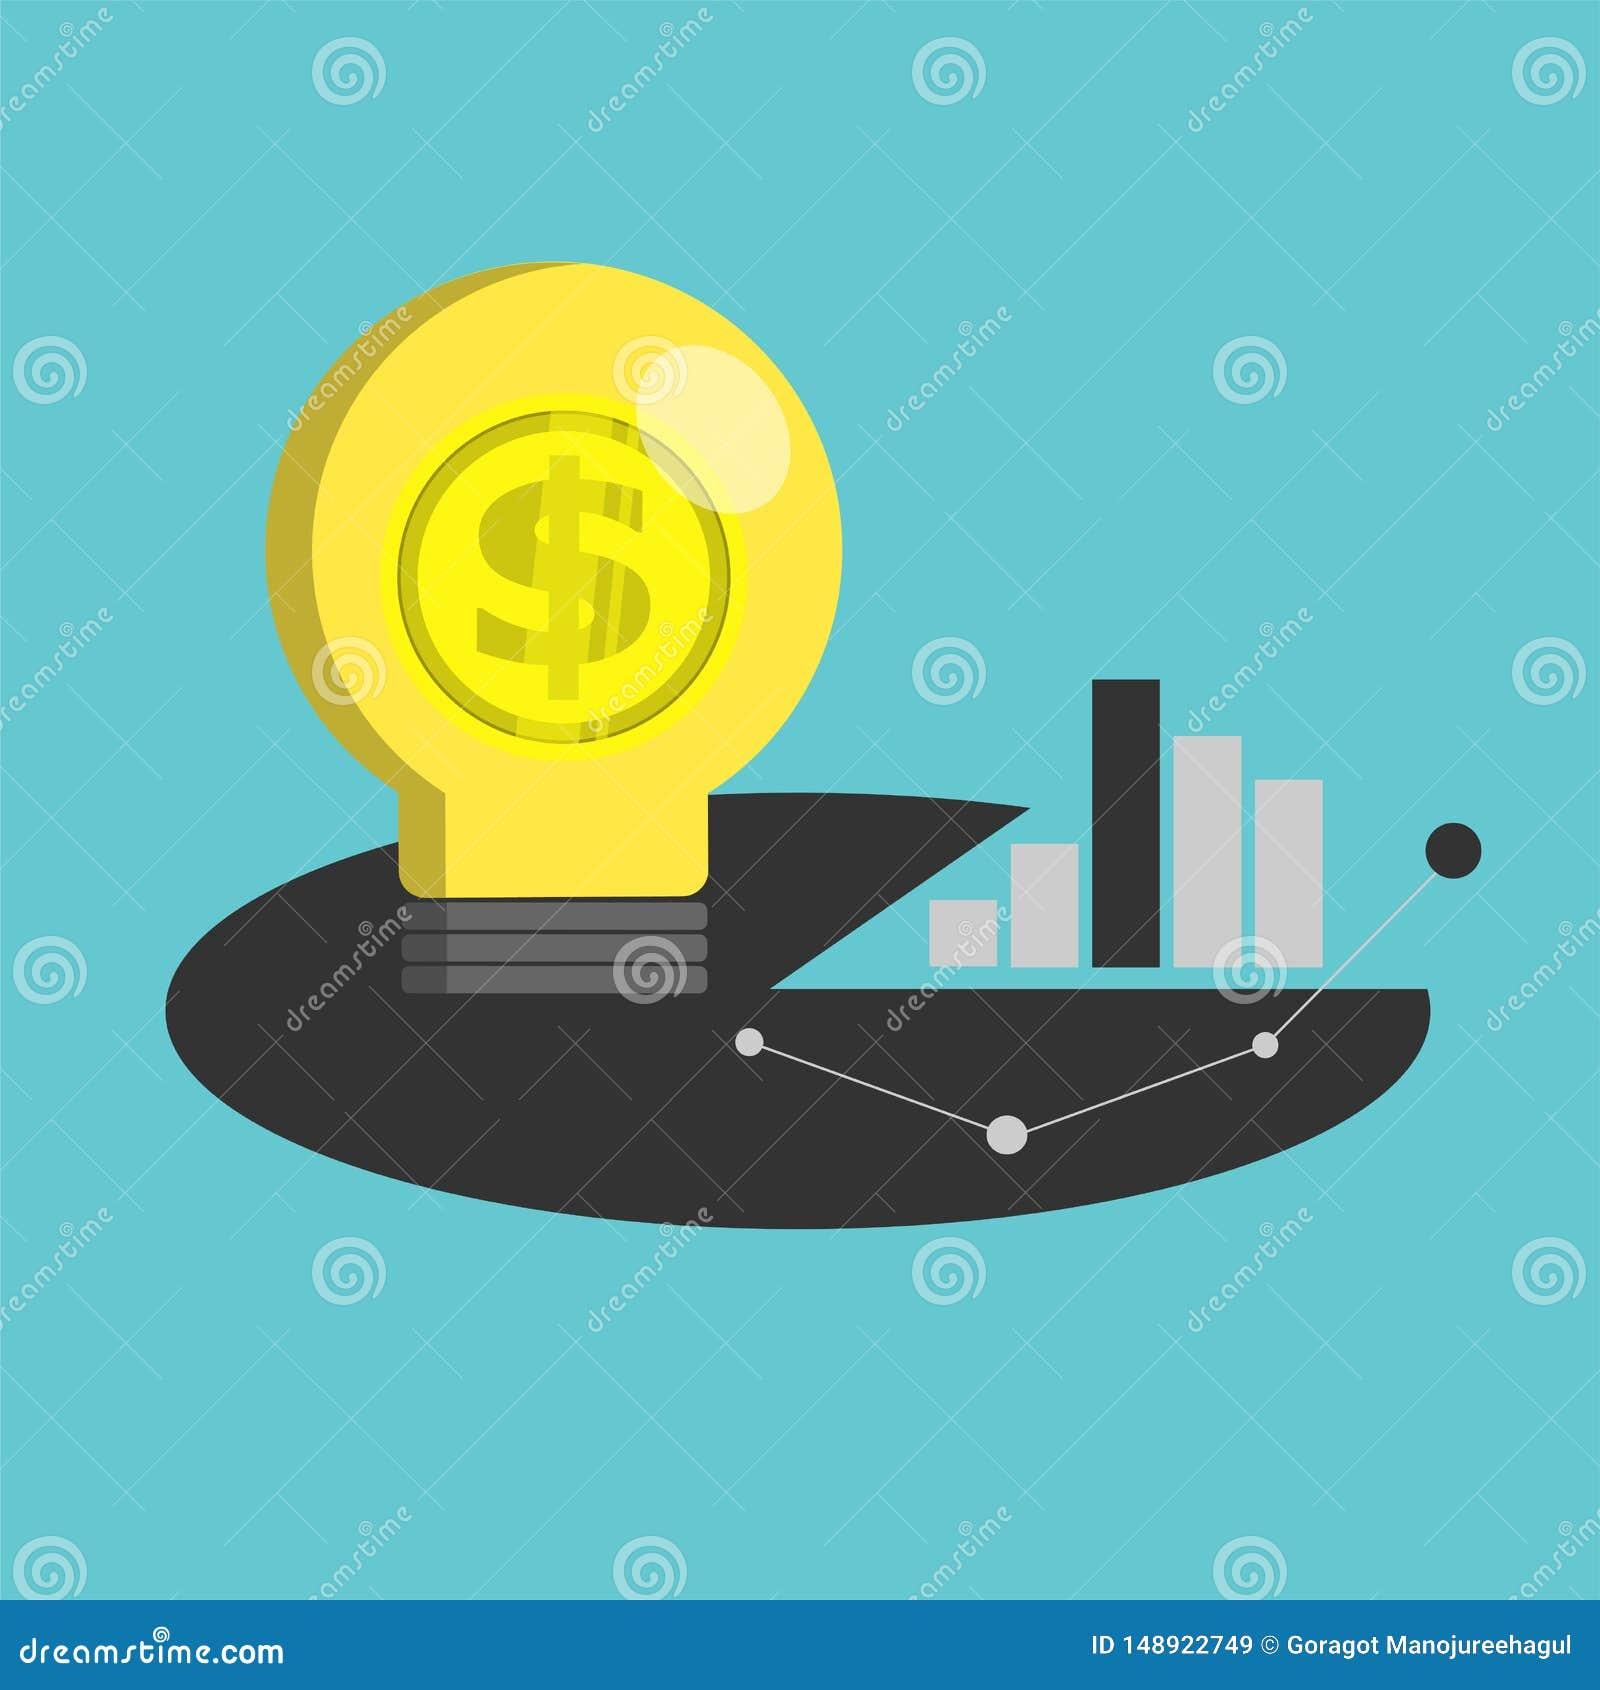 Light Bulb Gold Coin And Graph Vector Stock Vector